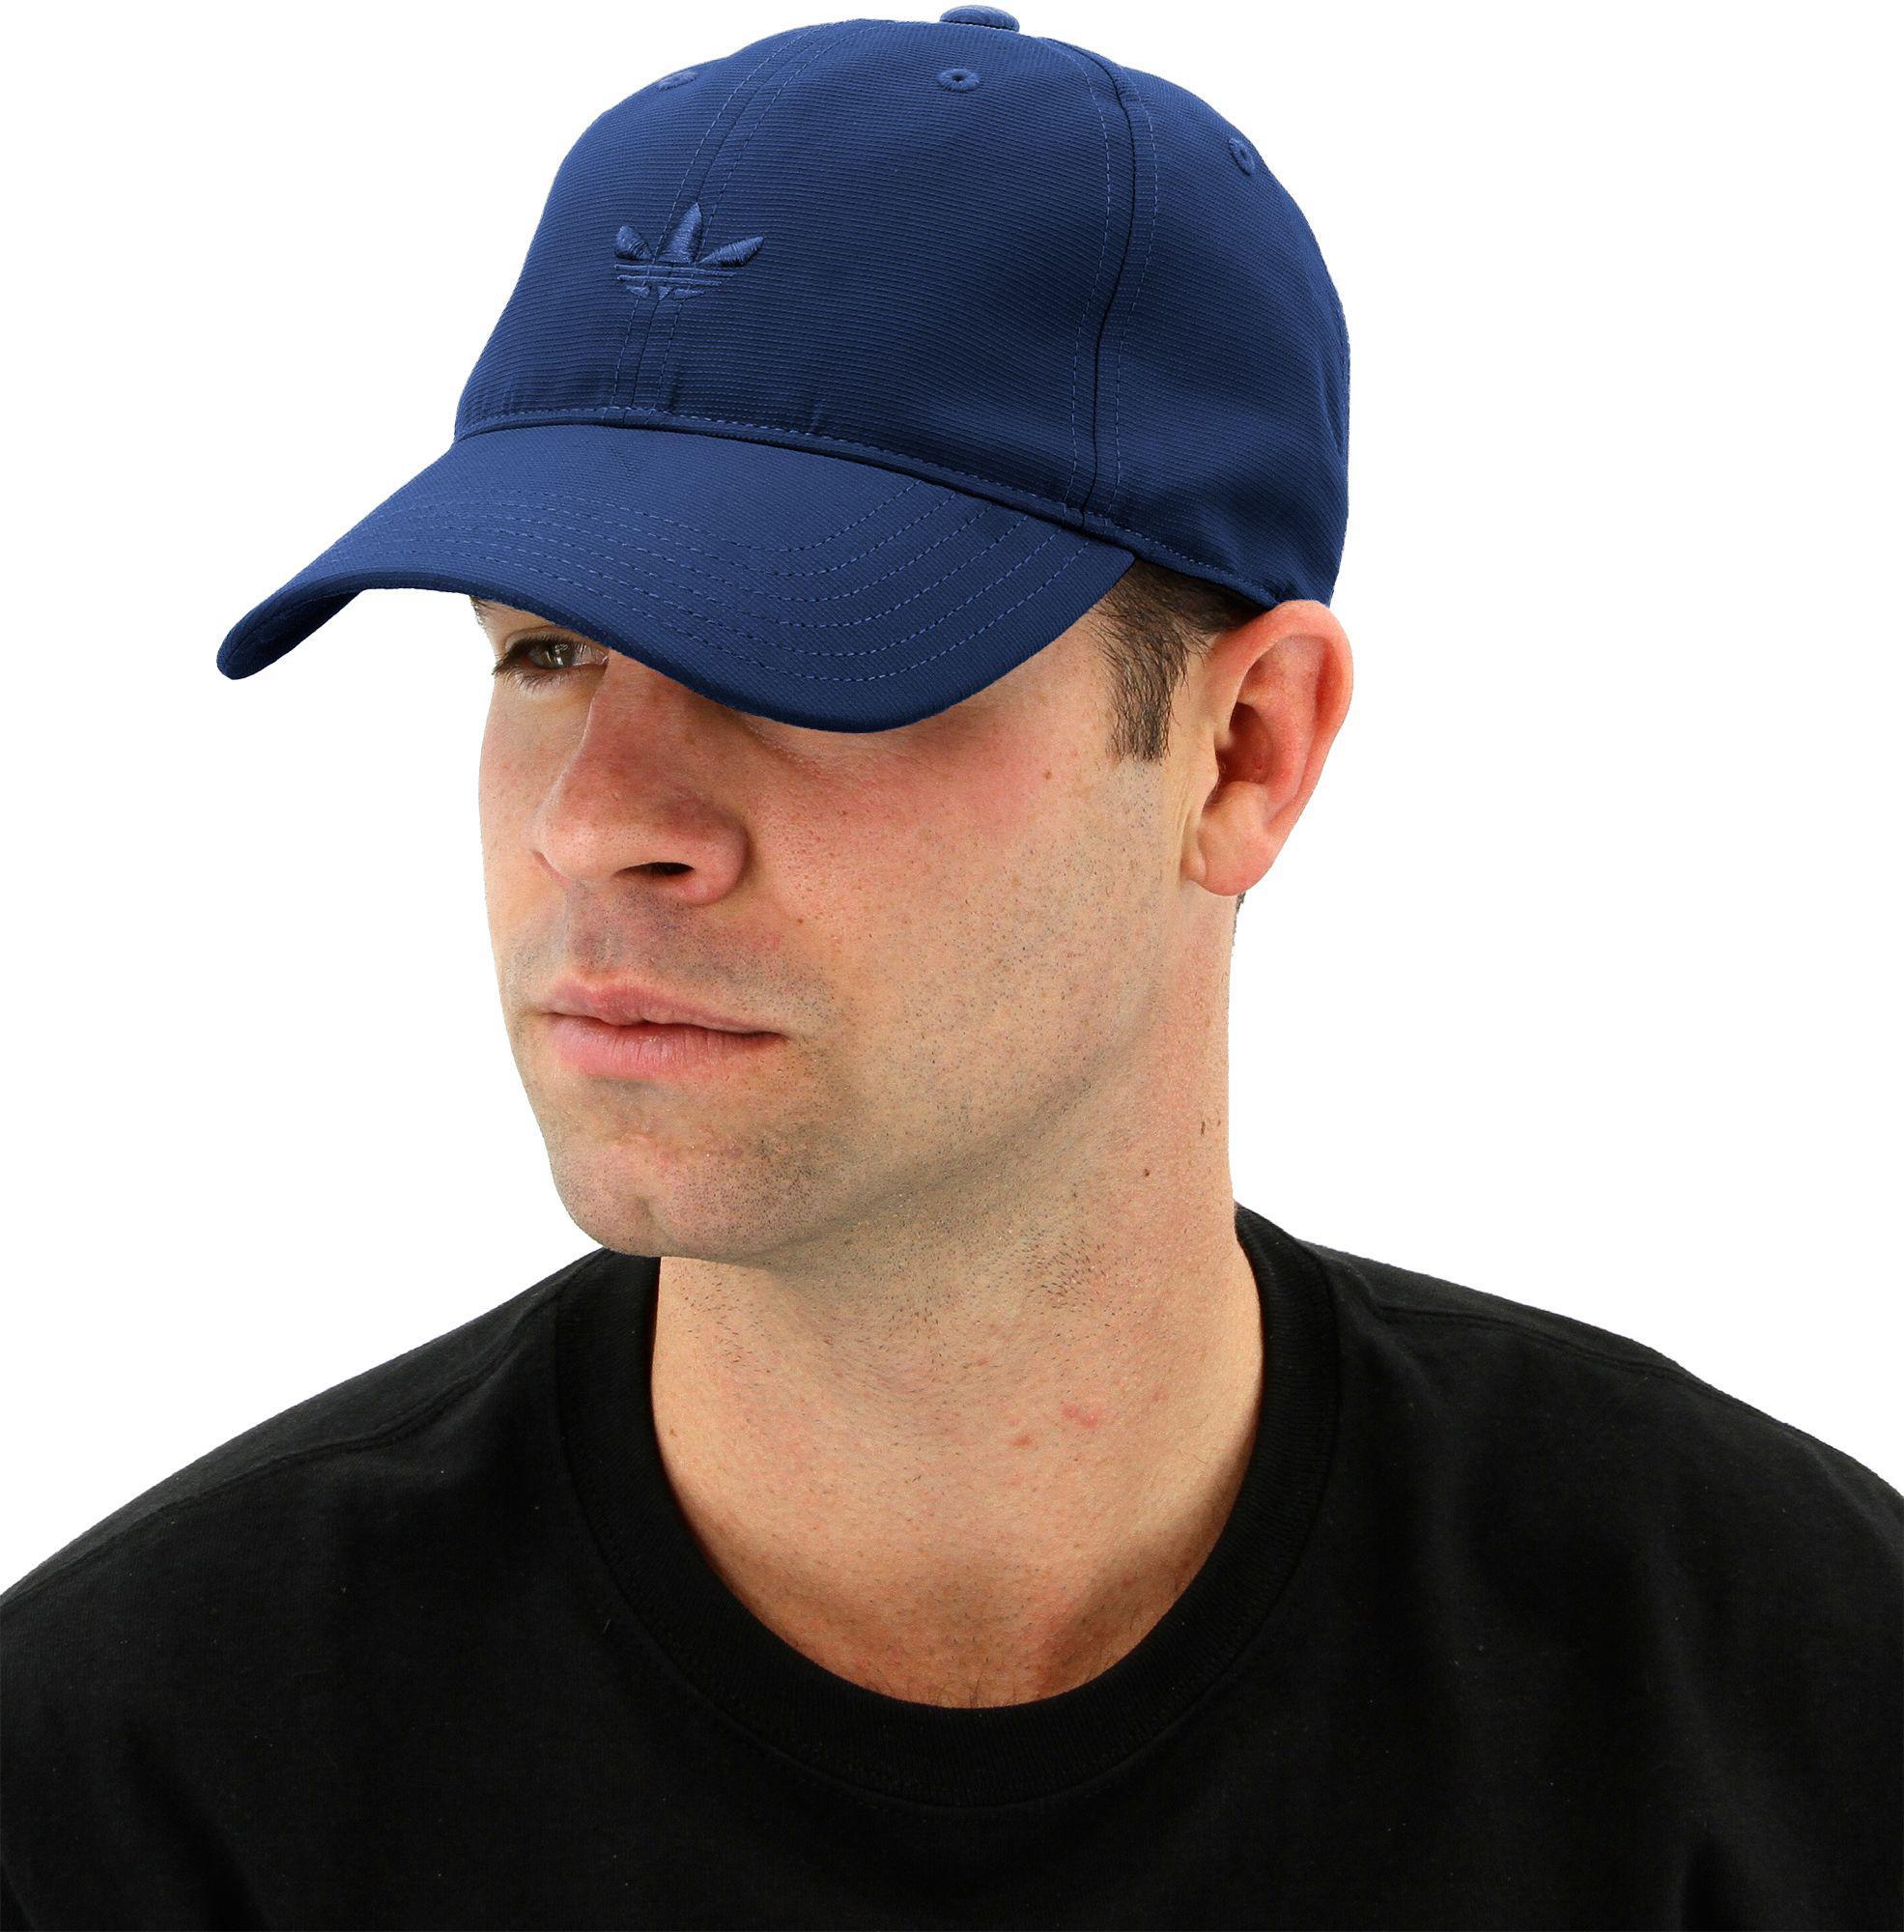 c56b4597c2c Lyst - adidas Originals Relaxed Modern Cap in Blue for Men